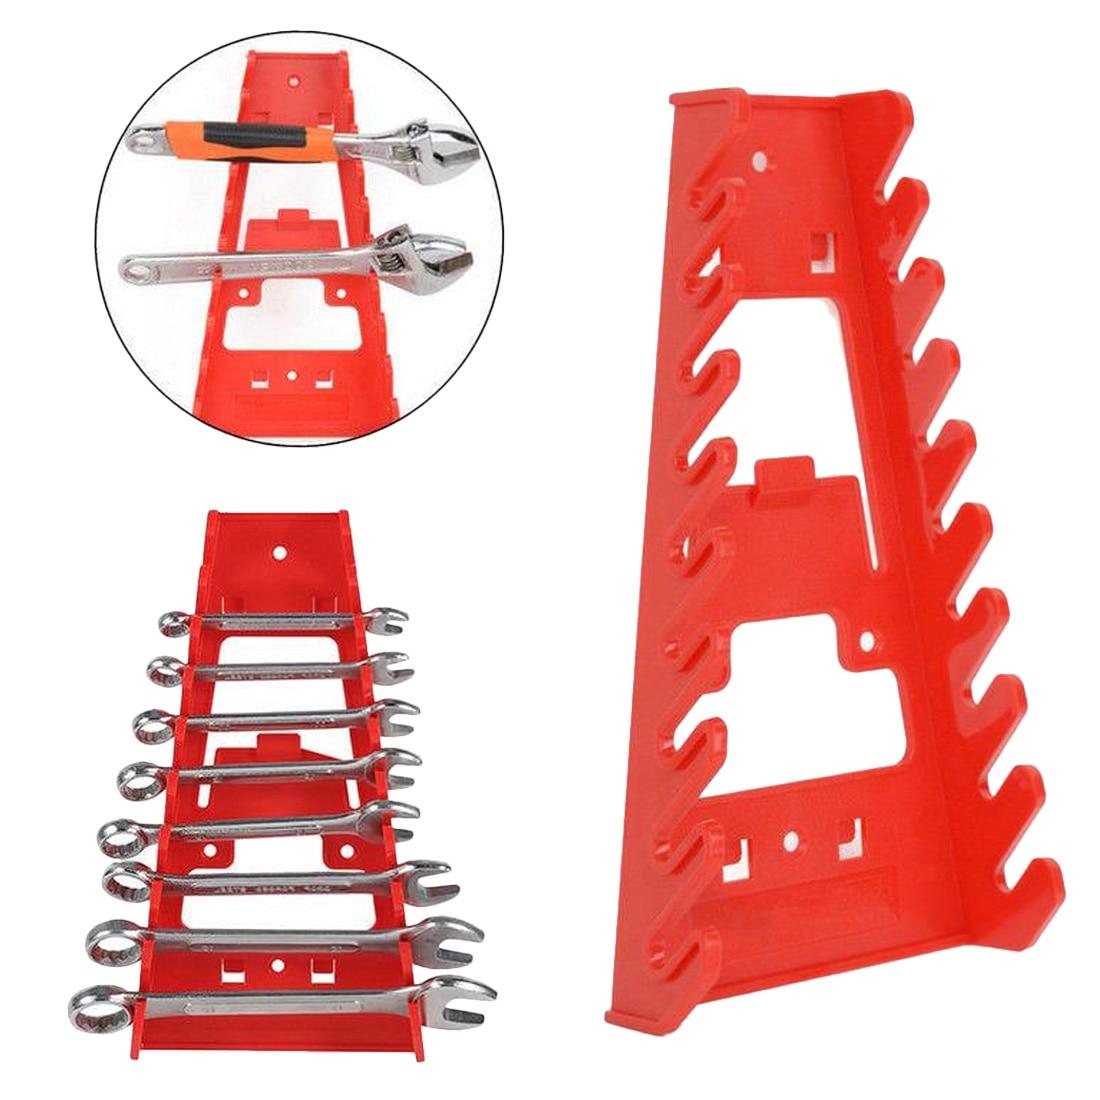 1pcs Wrench Spanner Organizer Sorter Holder Tray Socket Craftsman Storage Rack Tools